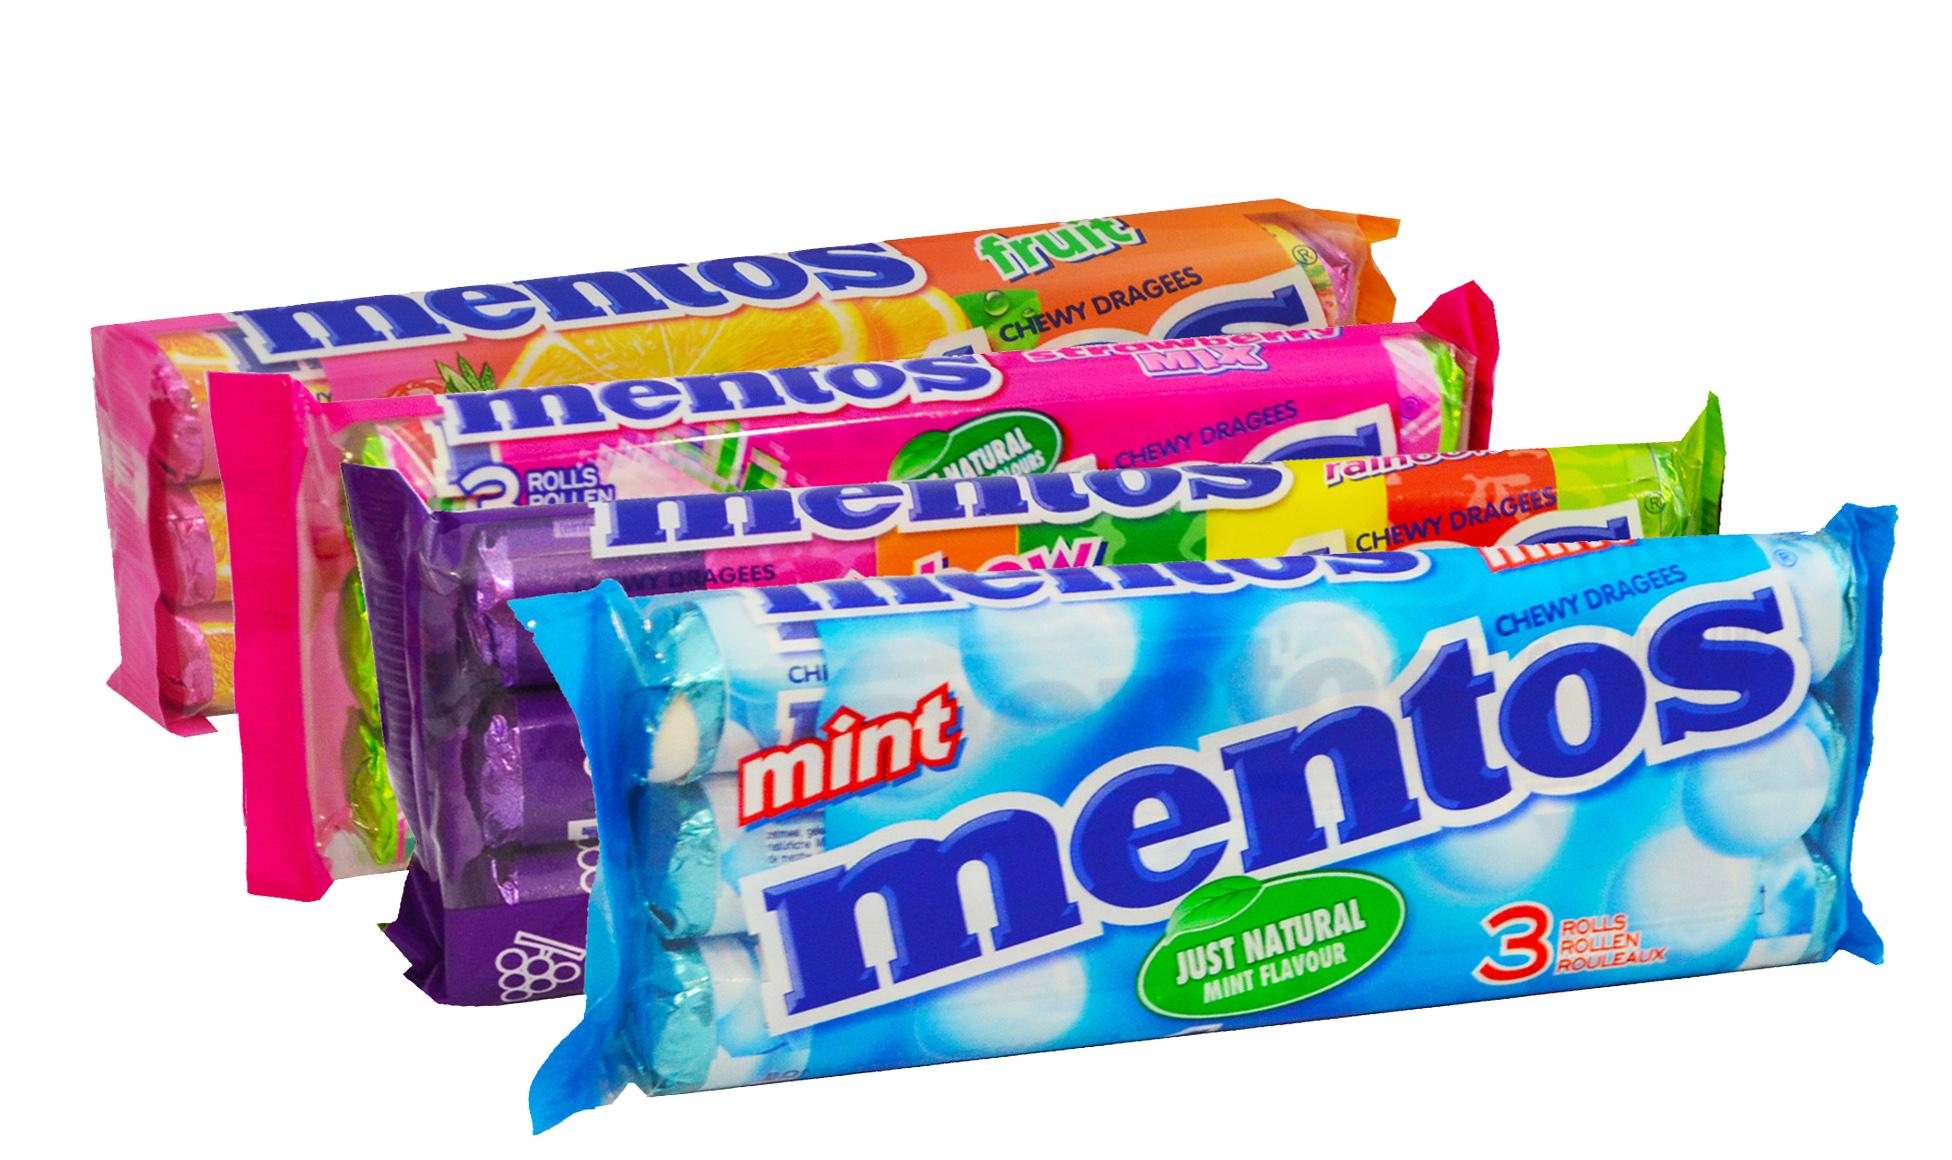 Mentos Rainbow drażetki do żucia różne smaki 3 x 38 g Image